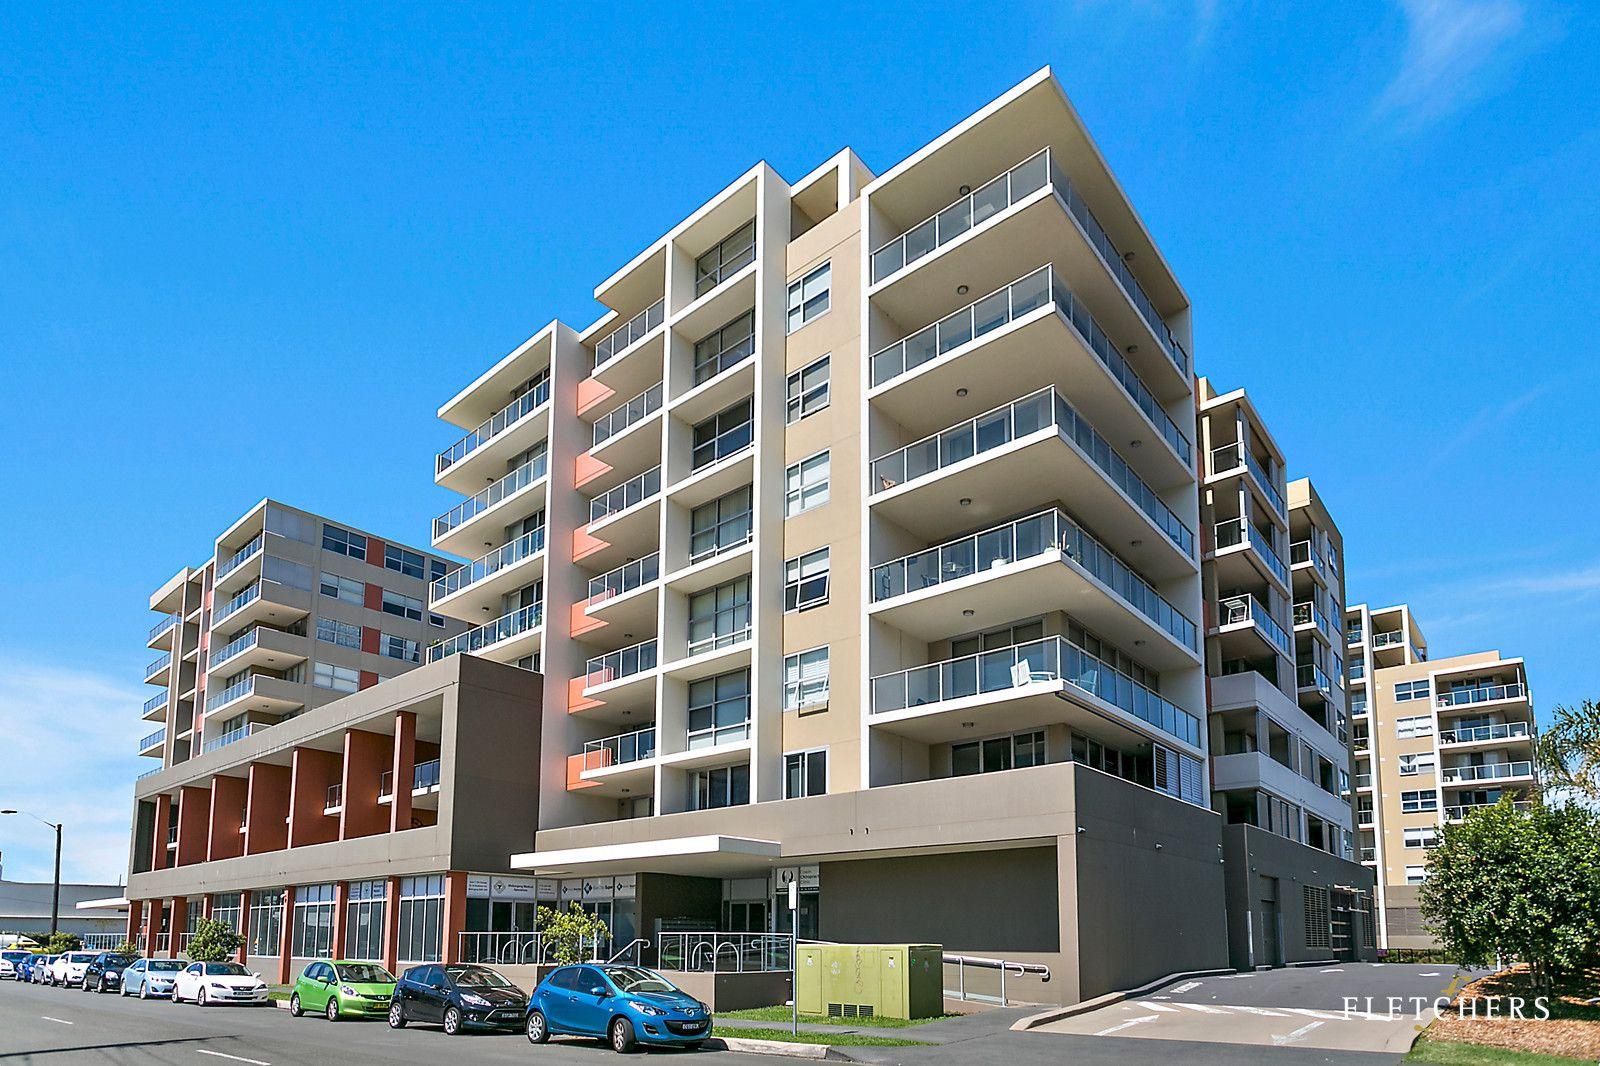 15/22-32 Gladstone Avenue, Wollongong NSW 2500, Image 0